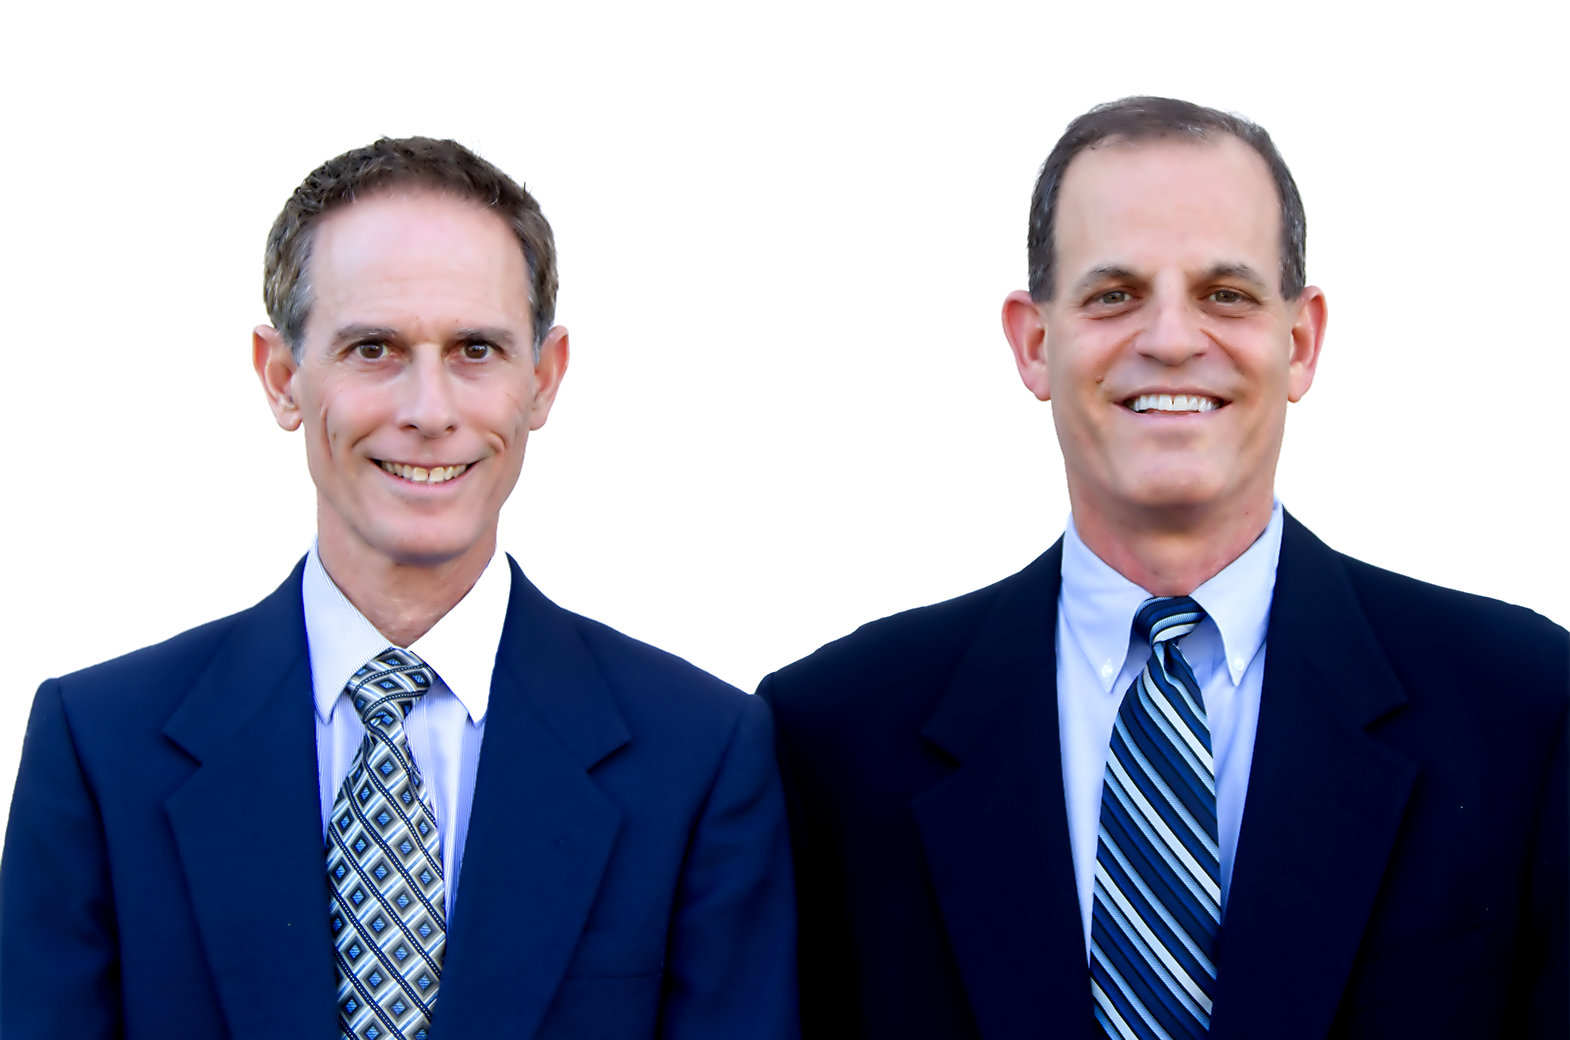 Dr. Bruce Fletcher and Dr. Elliott Hinkes